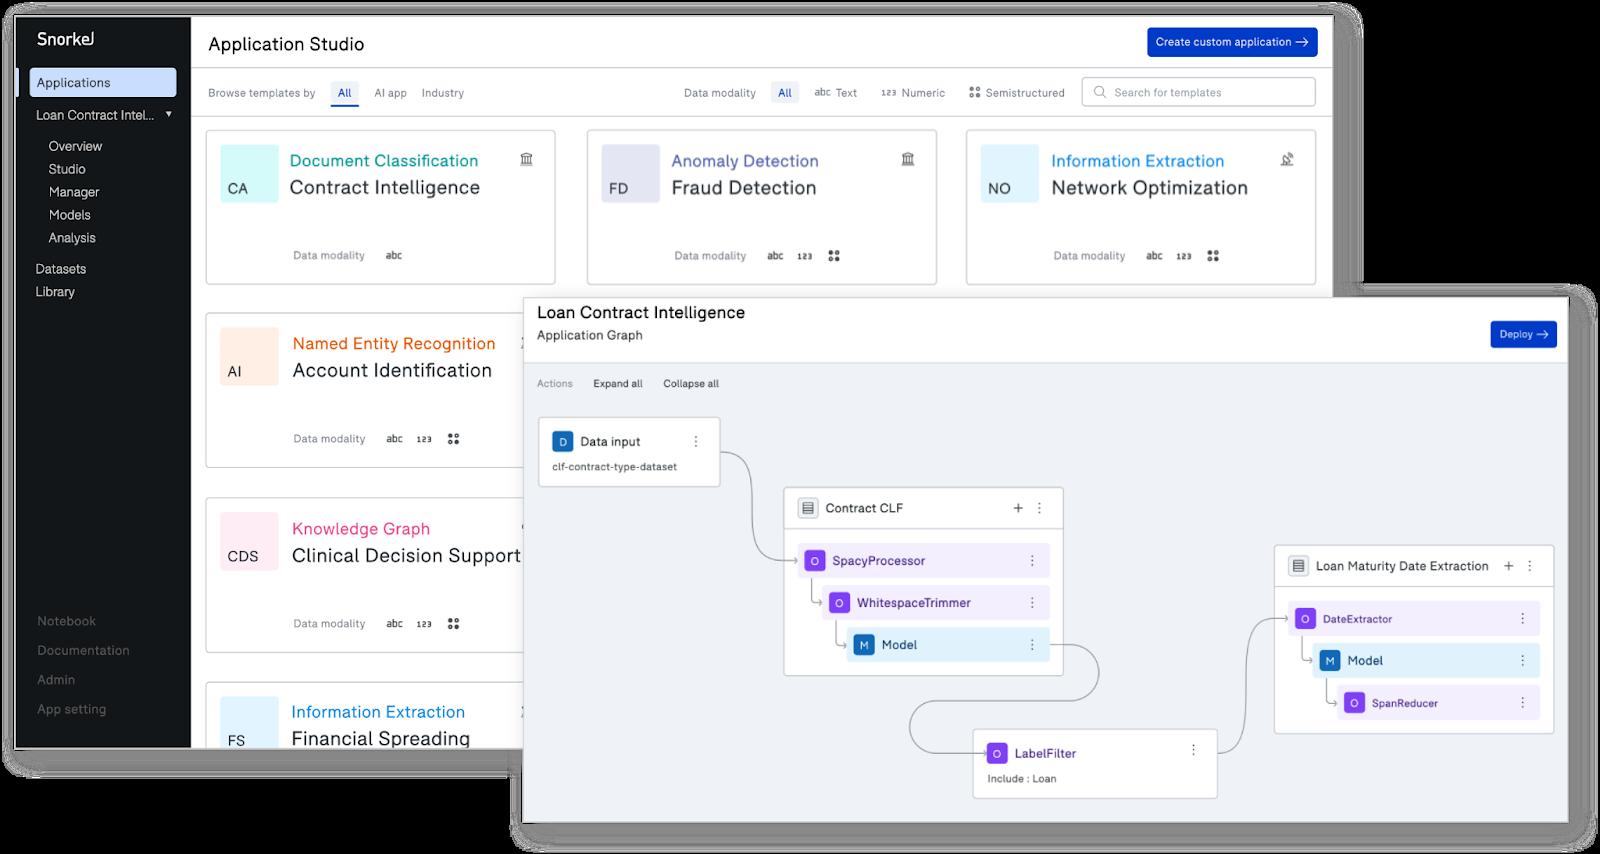 Application Studio platform on Snorkel Flow by Snorkel AI